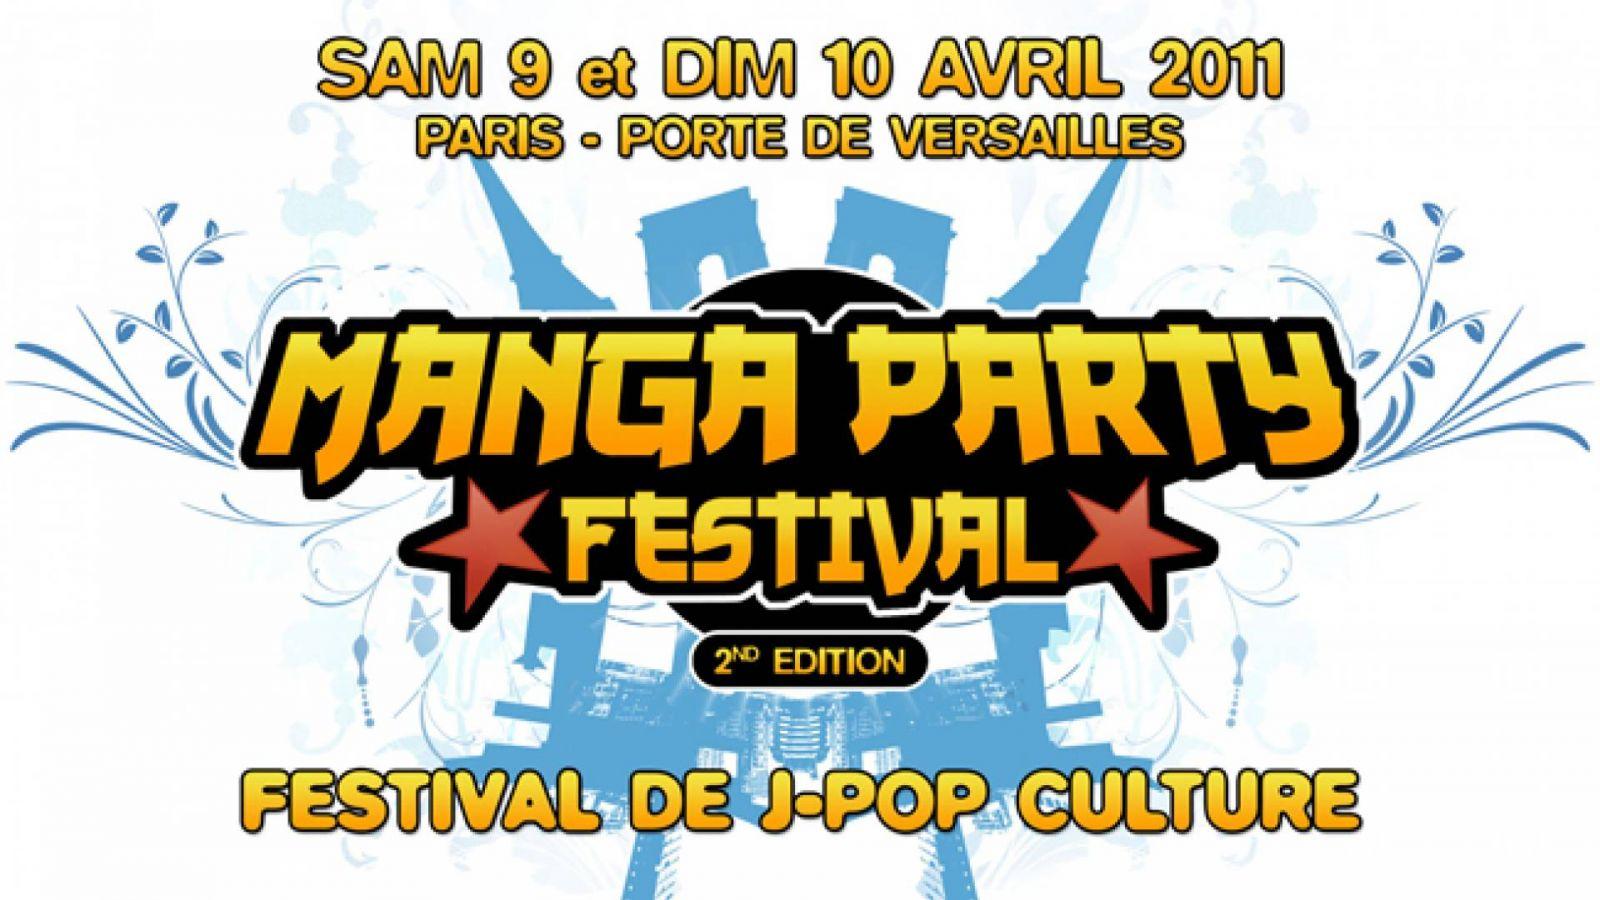 Le programme de Manga Party Festival © Manga Party Festival